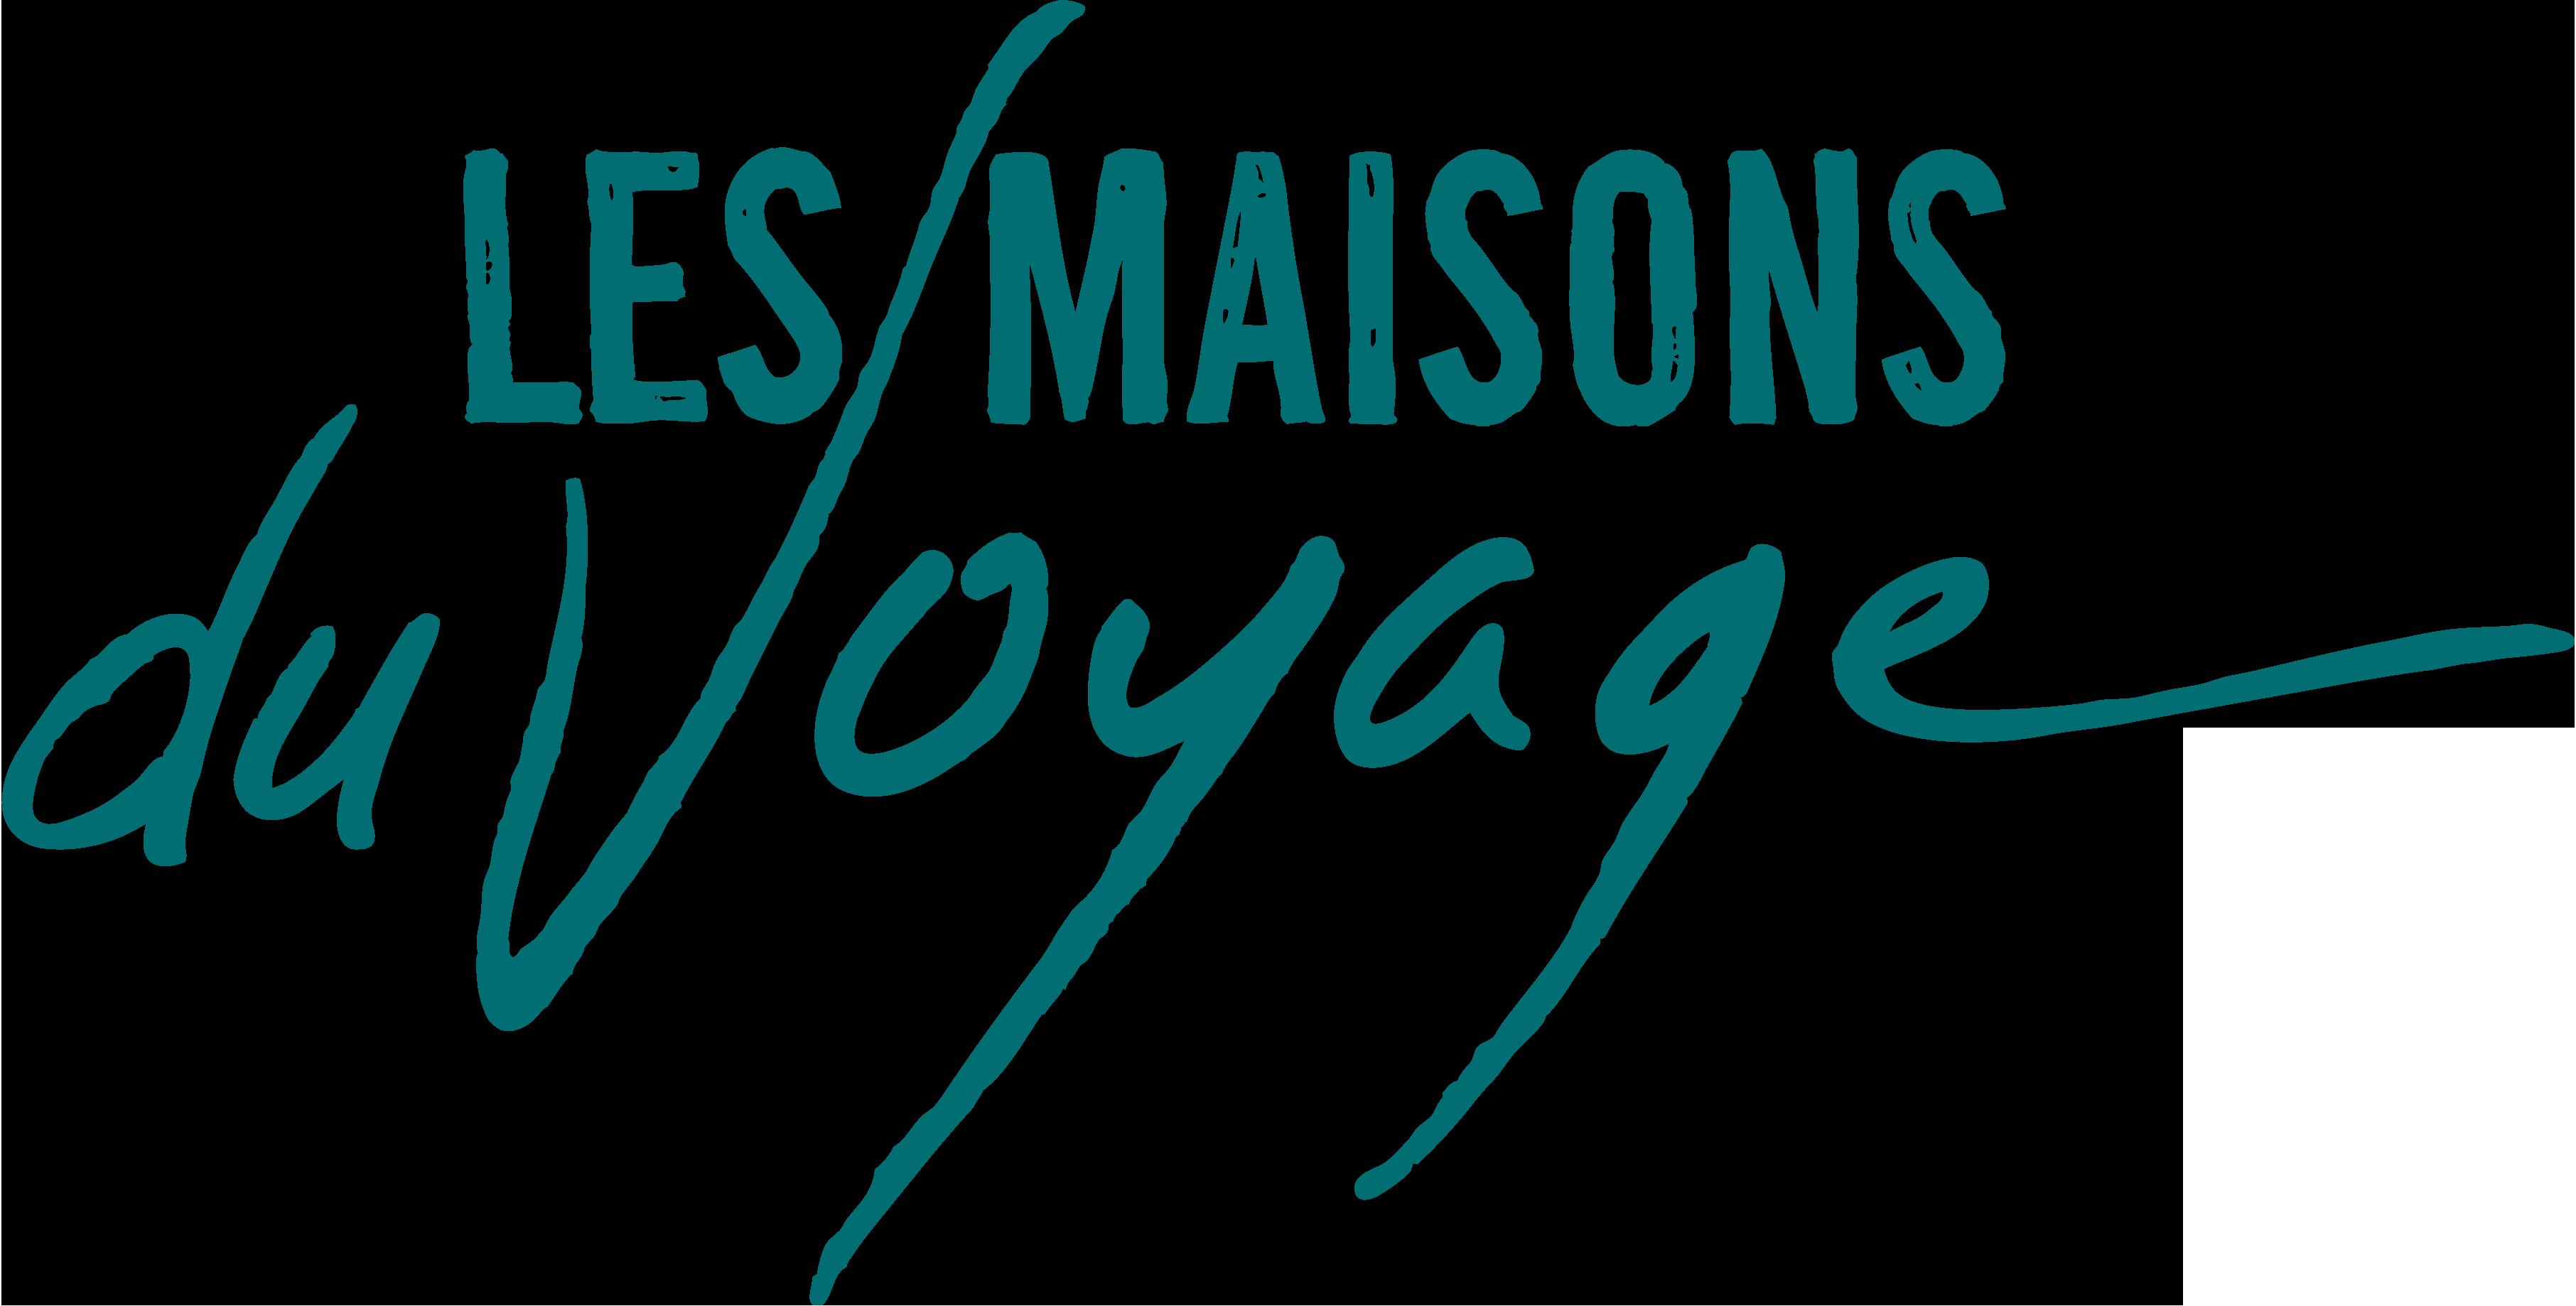 MAISONS-DU-VOYAGE